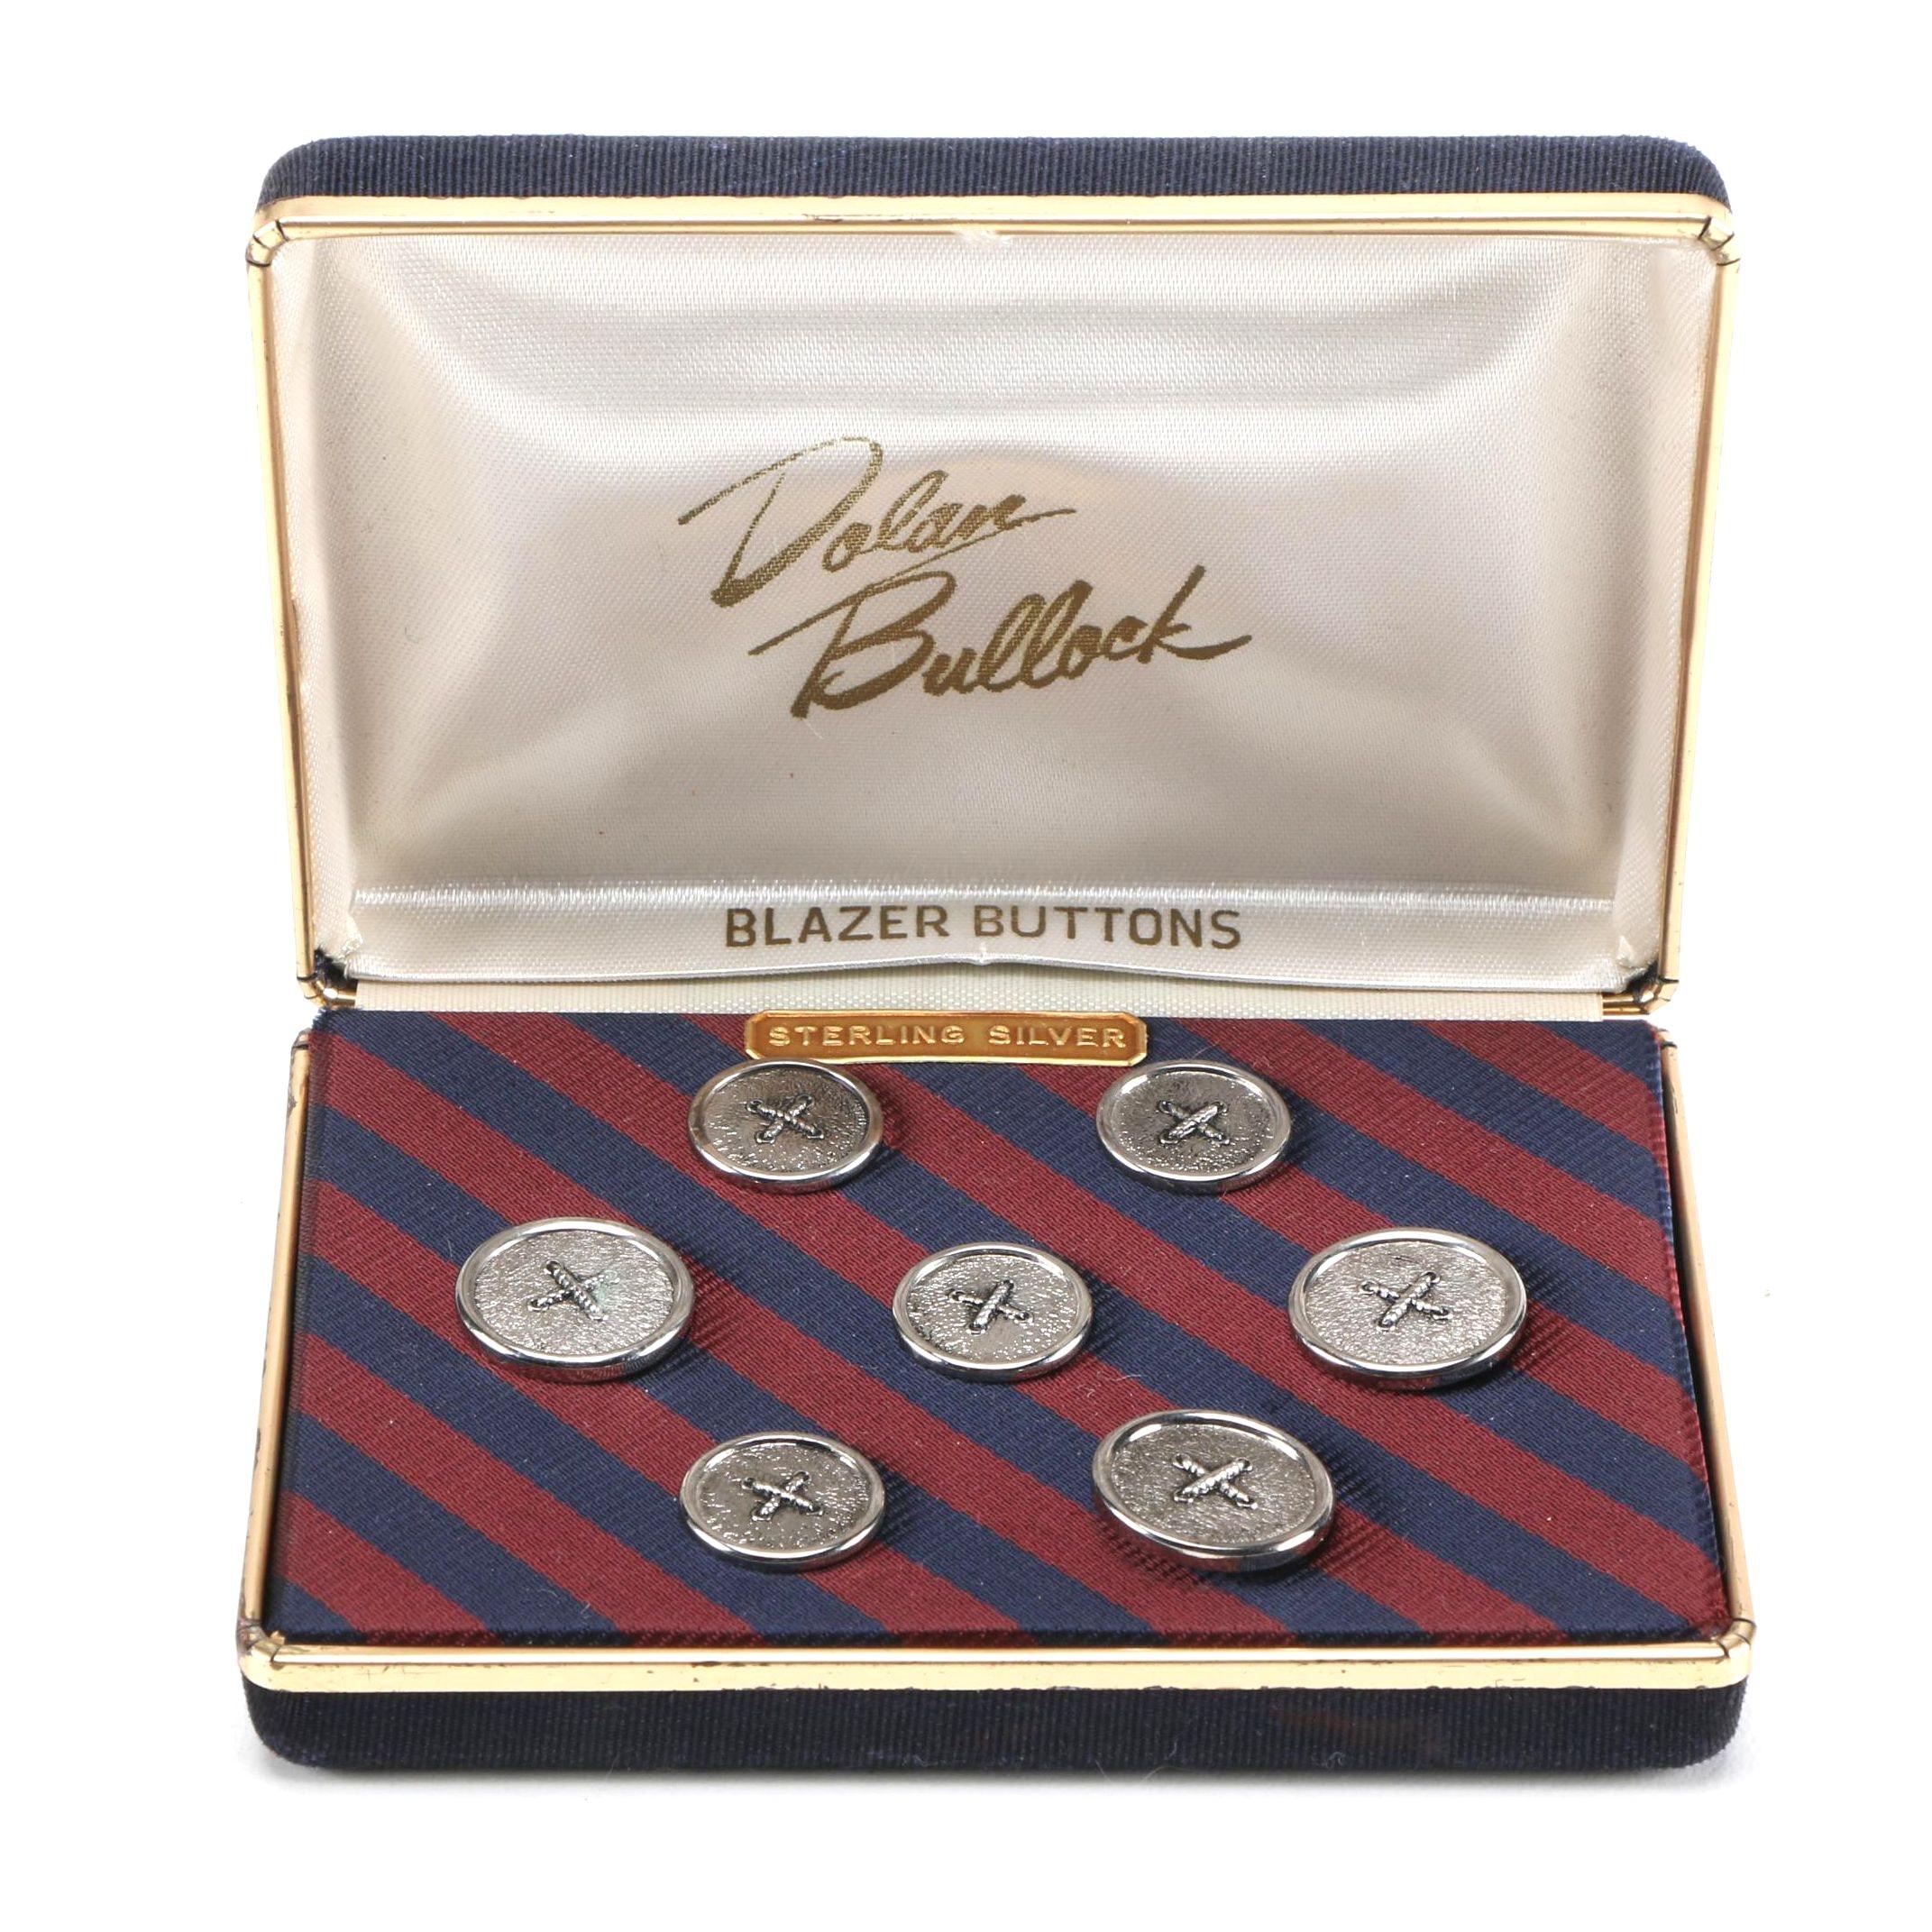 Sterling Silver Blazer Buttons by Dolan Bullock